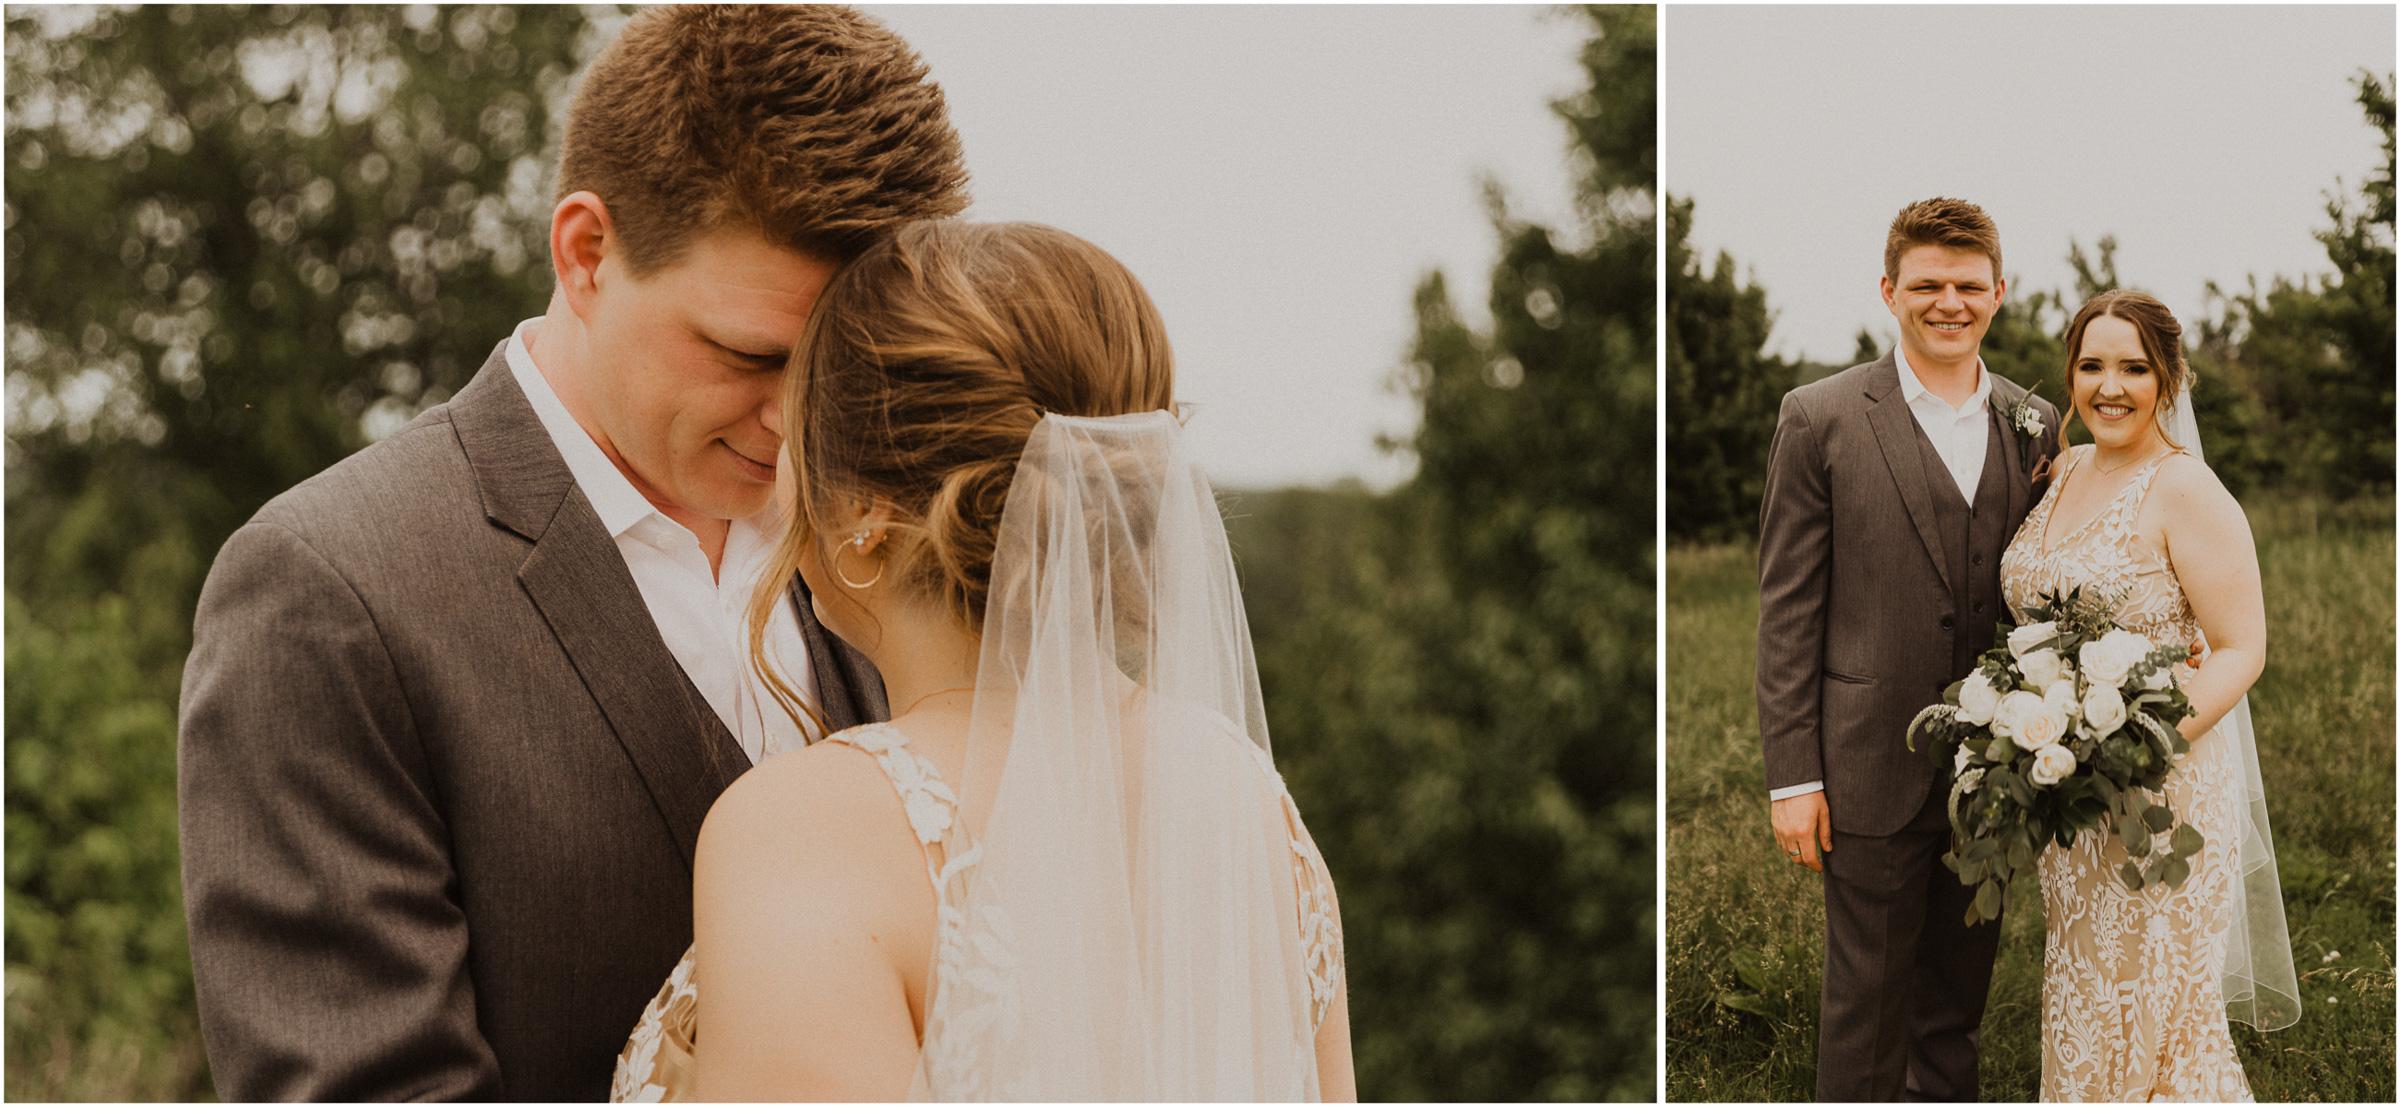 alyssa barletter photography weston red barn farm timberbarn summer outdoor wedding-19.jpg